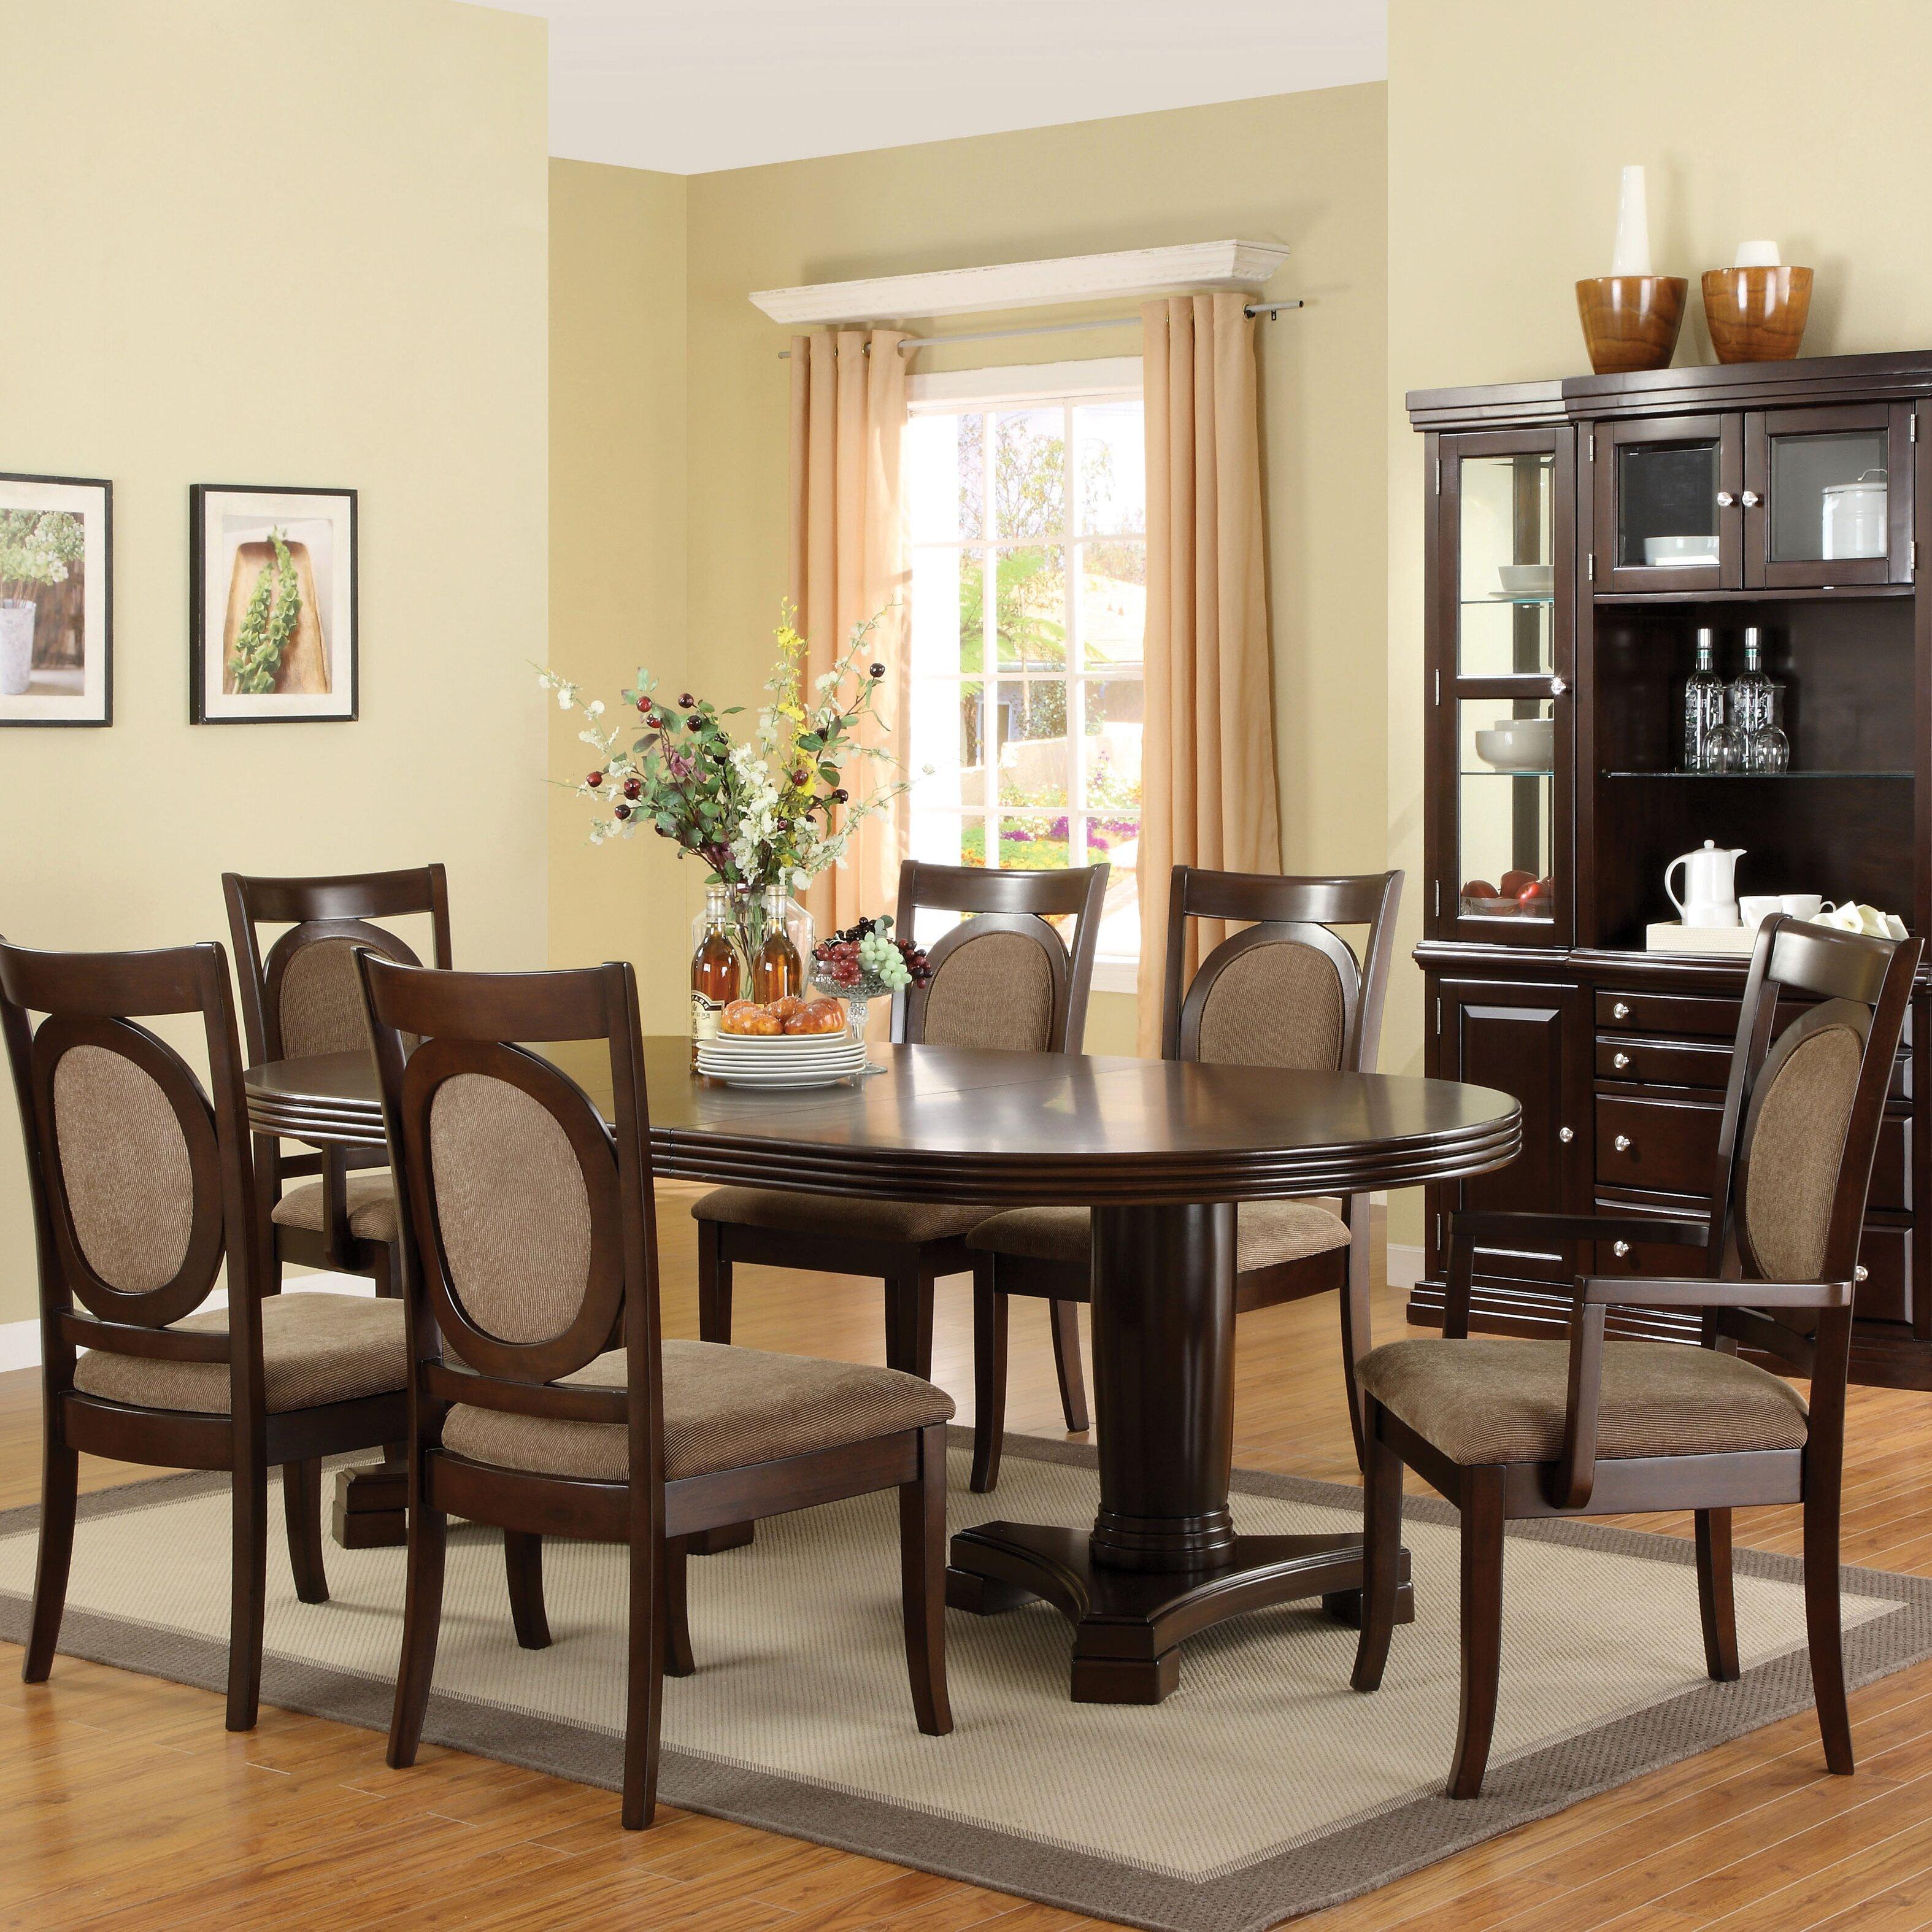 hokku designs regan 7 piece dining set reviews wayfair dinin